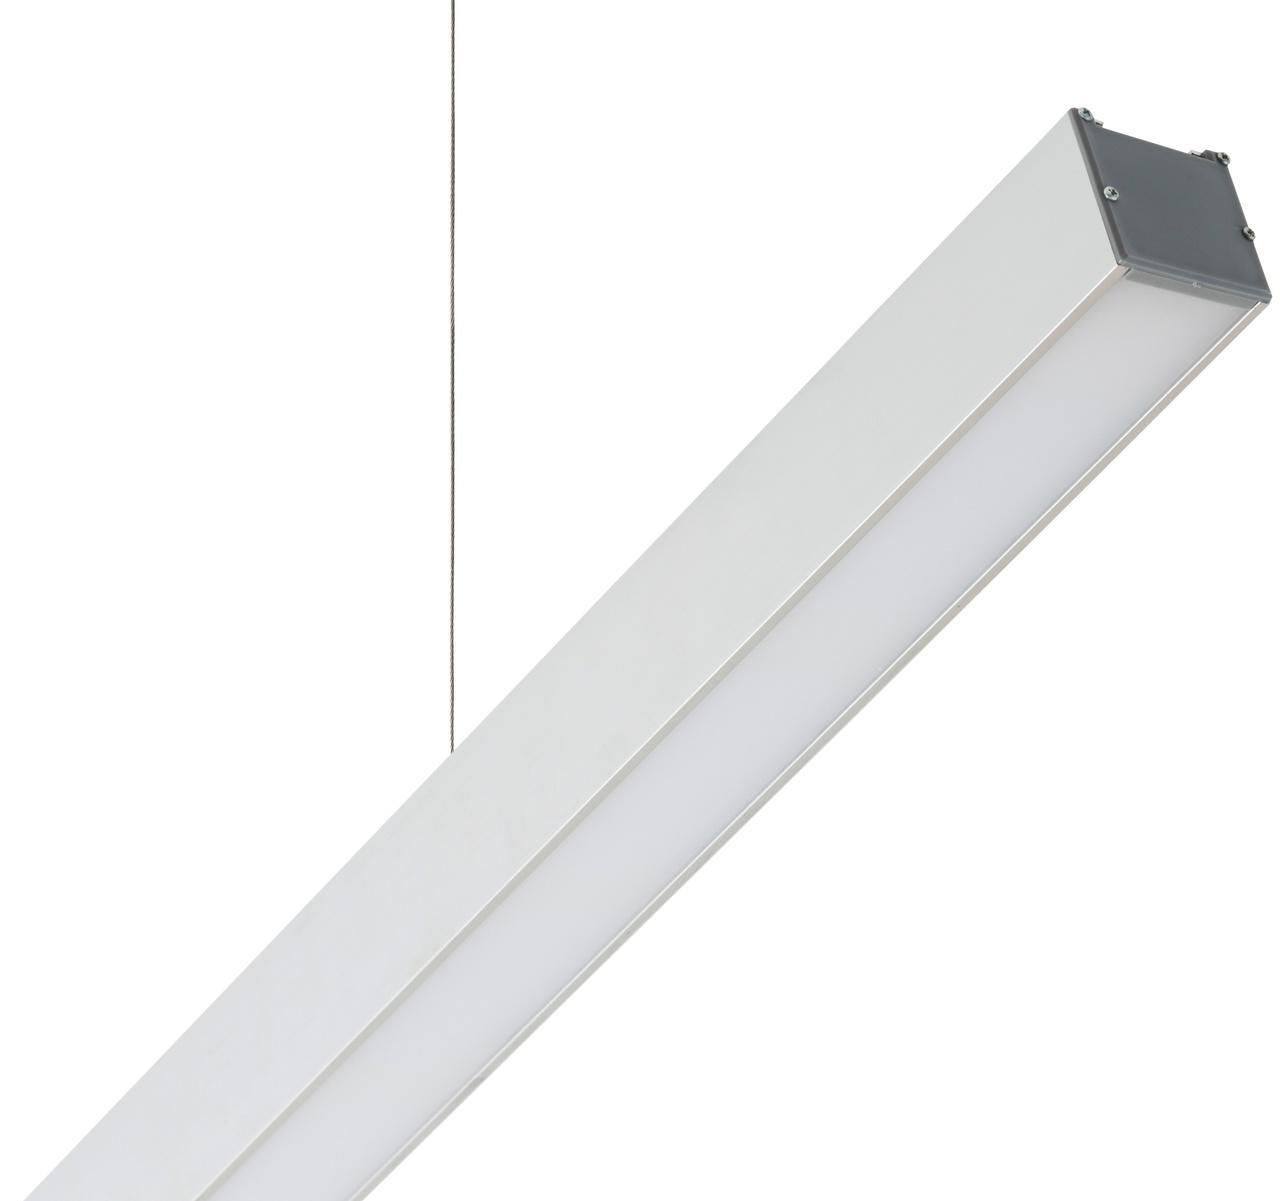 Светильник LED Laura Opal 76Вт 4000К 6800Лм 2420x50x50мм доп. вид